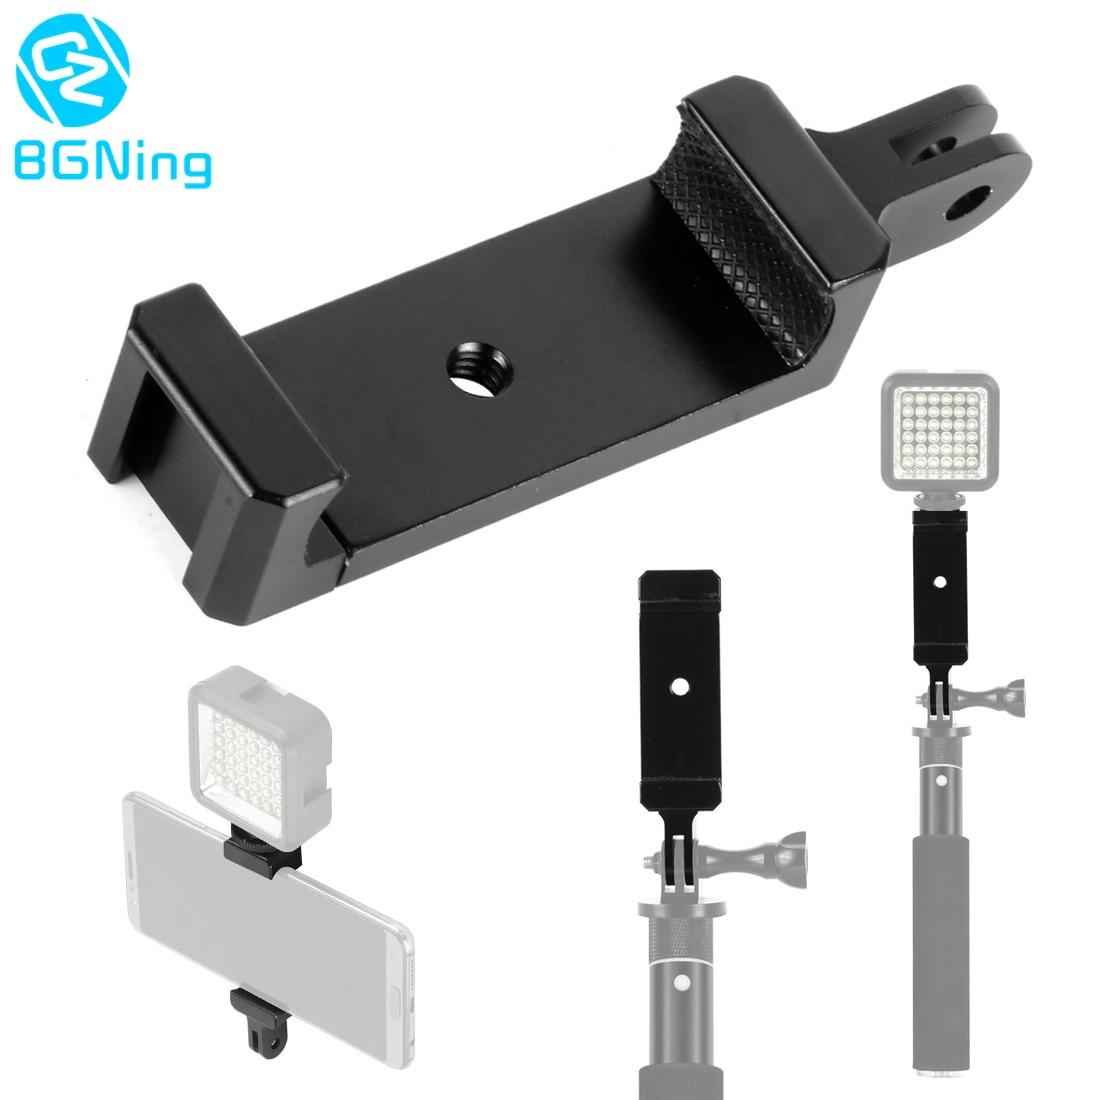 Soporte de teléfono Clip adaptador de trípode 1/4 agujero y abrazadera de montaje de zapata fría para iPhone para Huawei mi para Gopro Cámara monopié Selfie